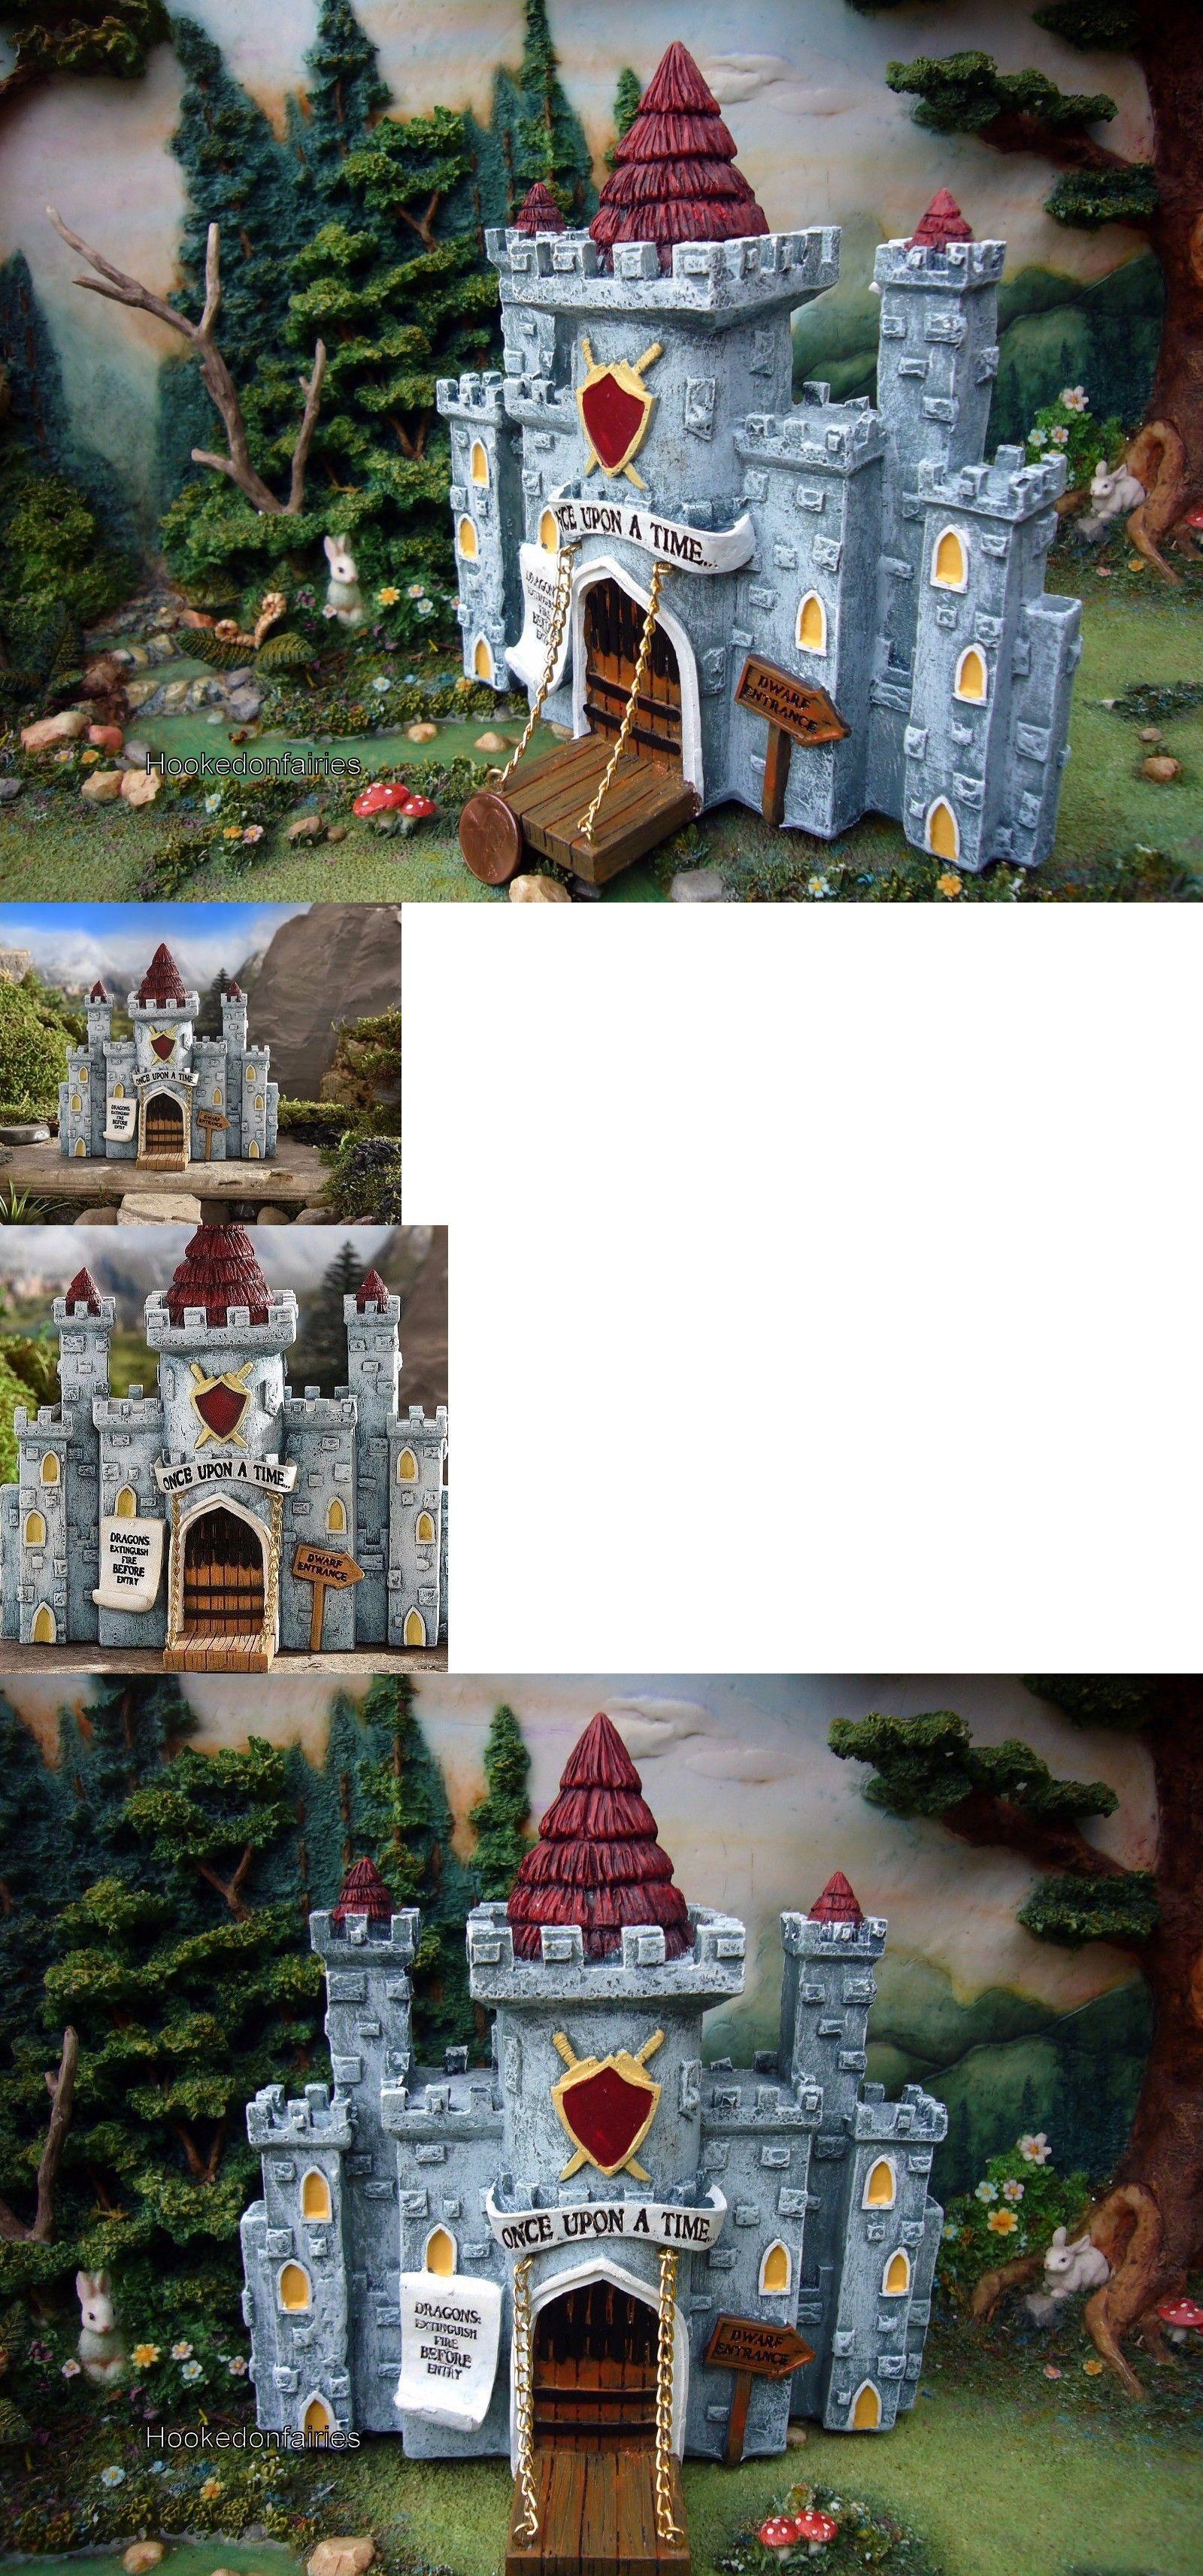 Fairy lawn ornaments - Statues And Lawn Ornaments 29511 Medieval Times Castle W Drawbridge Gi 700297 Miniature Fairy Garden